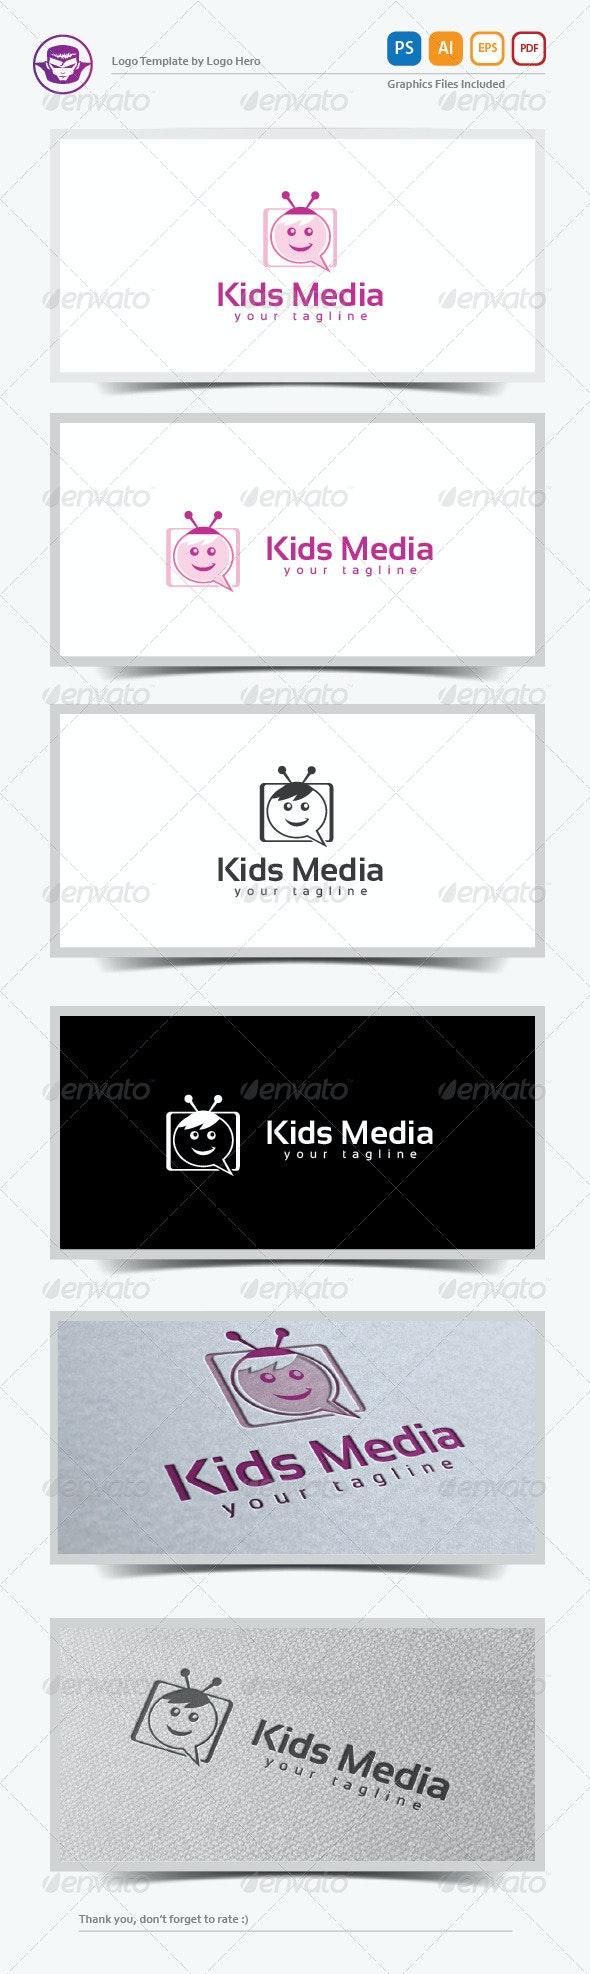 Kids Media Logo Template - Objects Logo Templates